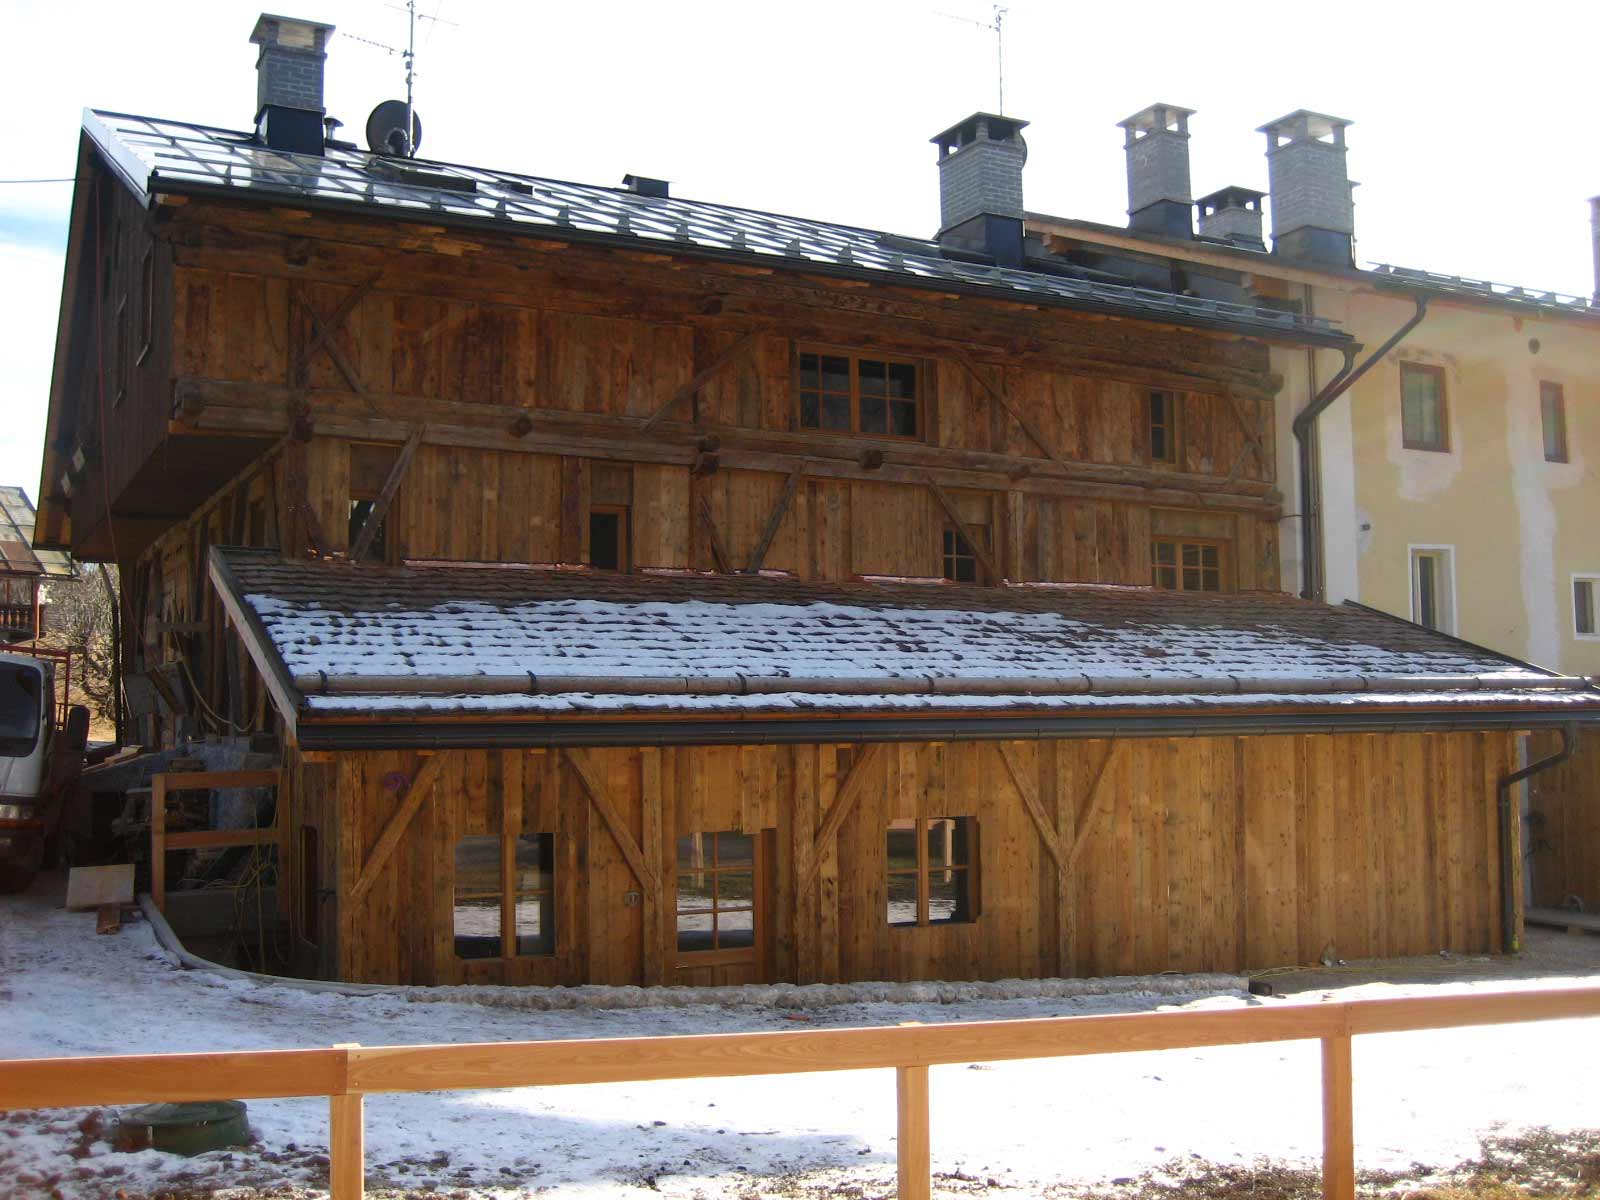 Ampliamento a Cortina d'Ampezzo Woodbau Longarone